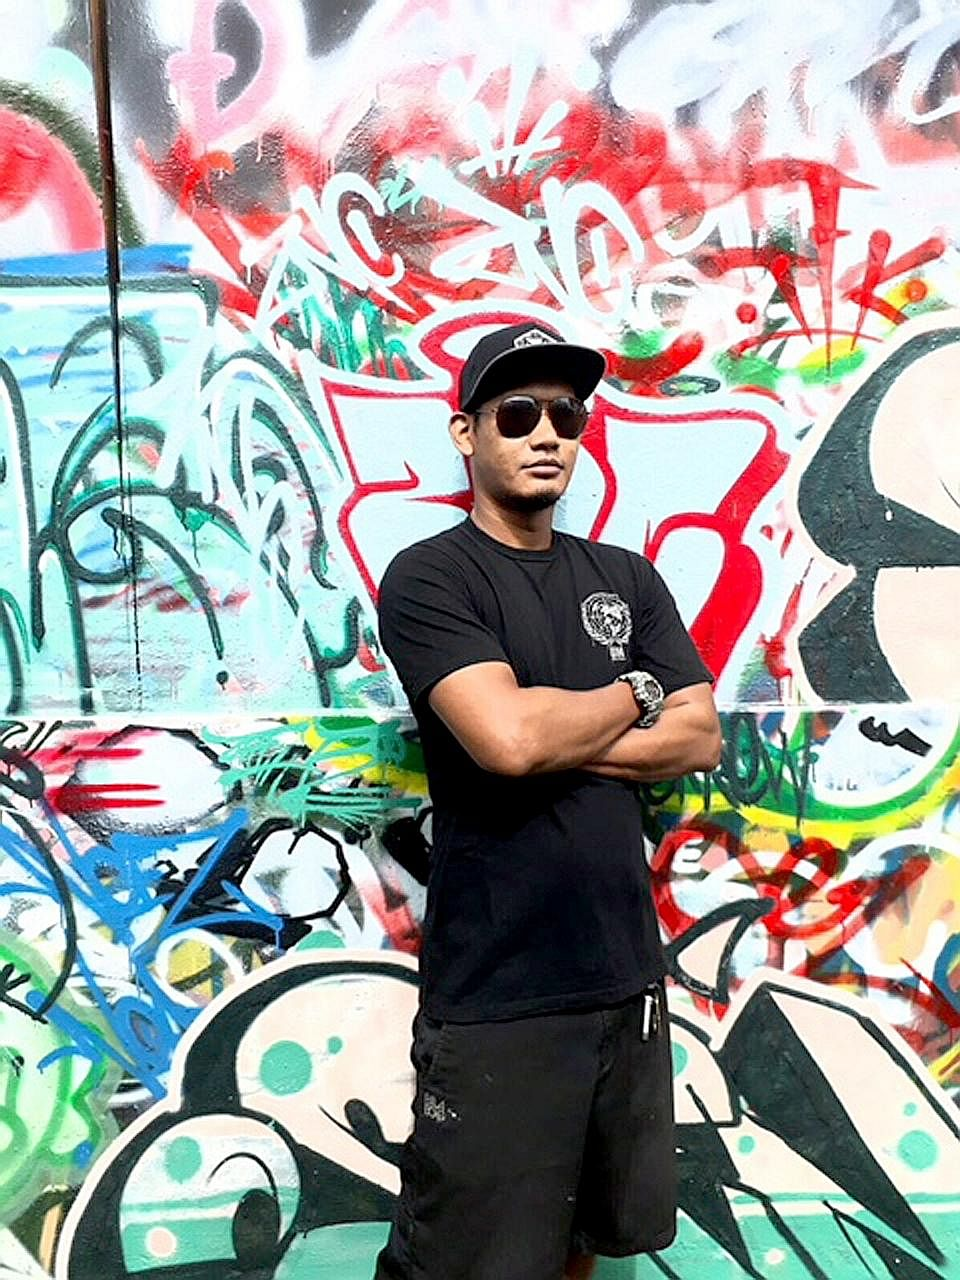 Ghairah Luah Perasaan Pada Lukisan Grafiti Di Tembok Berita Setempat Beritaharian Sg